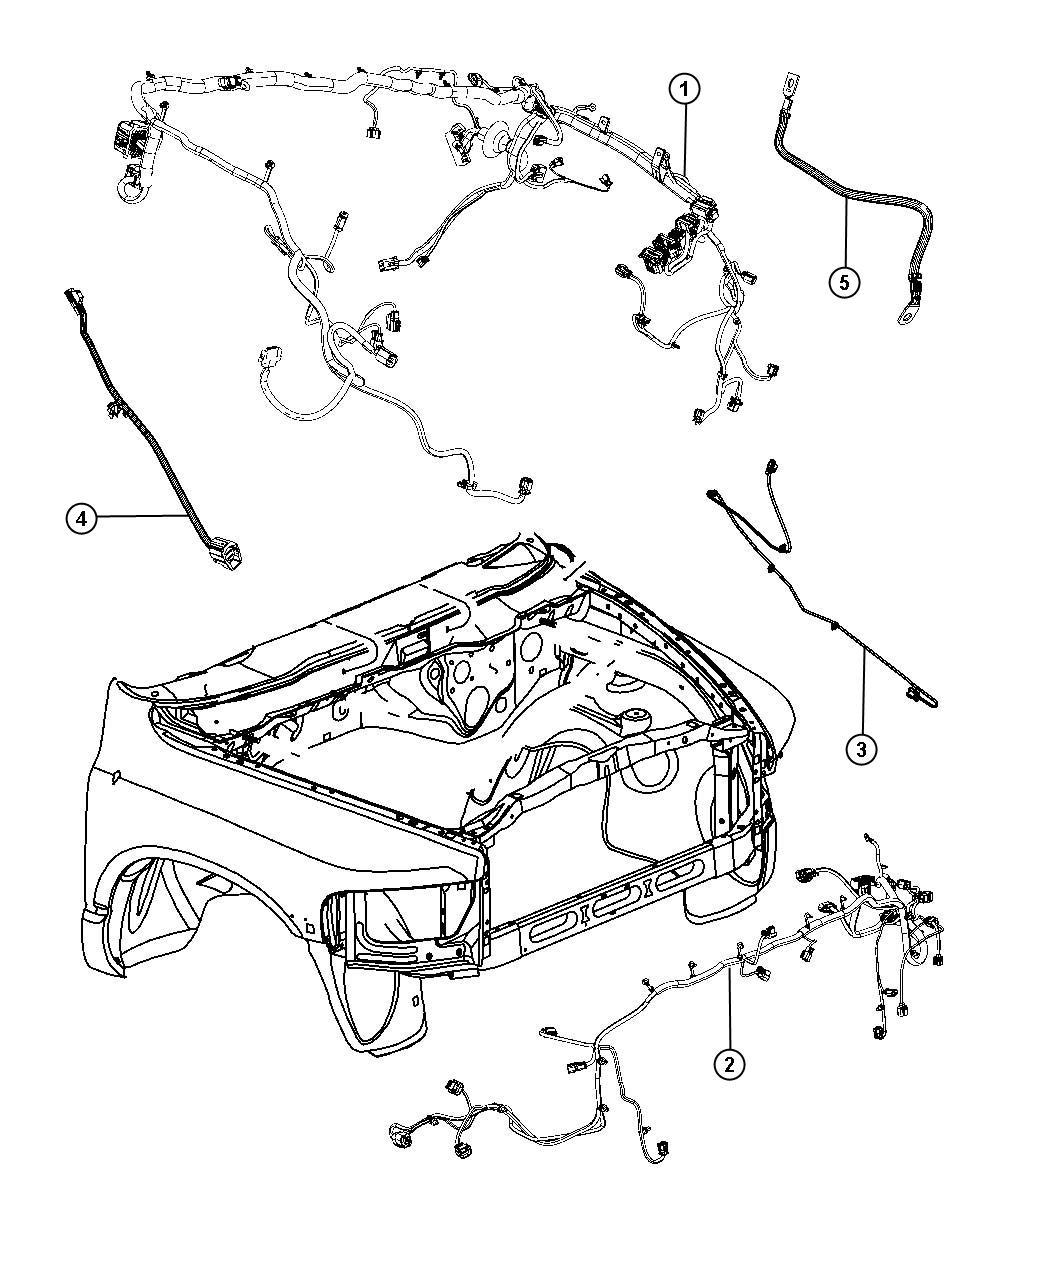 Dodge Ram 1500 Wiring. Front end module. [remote start